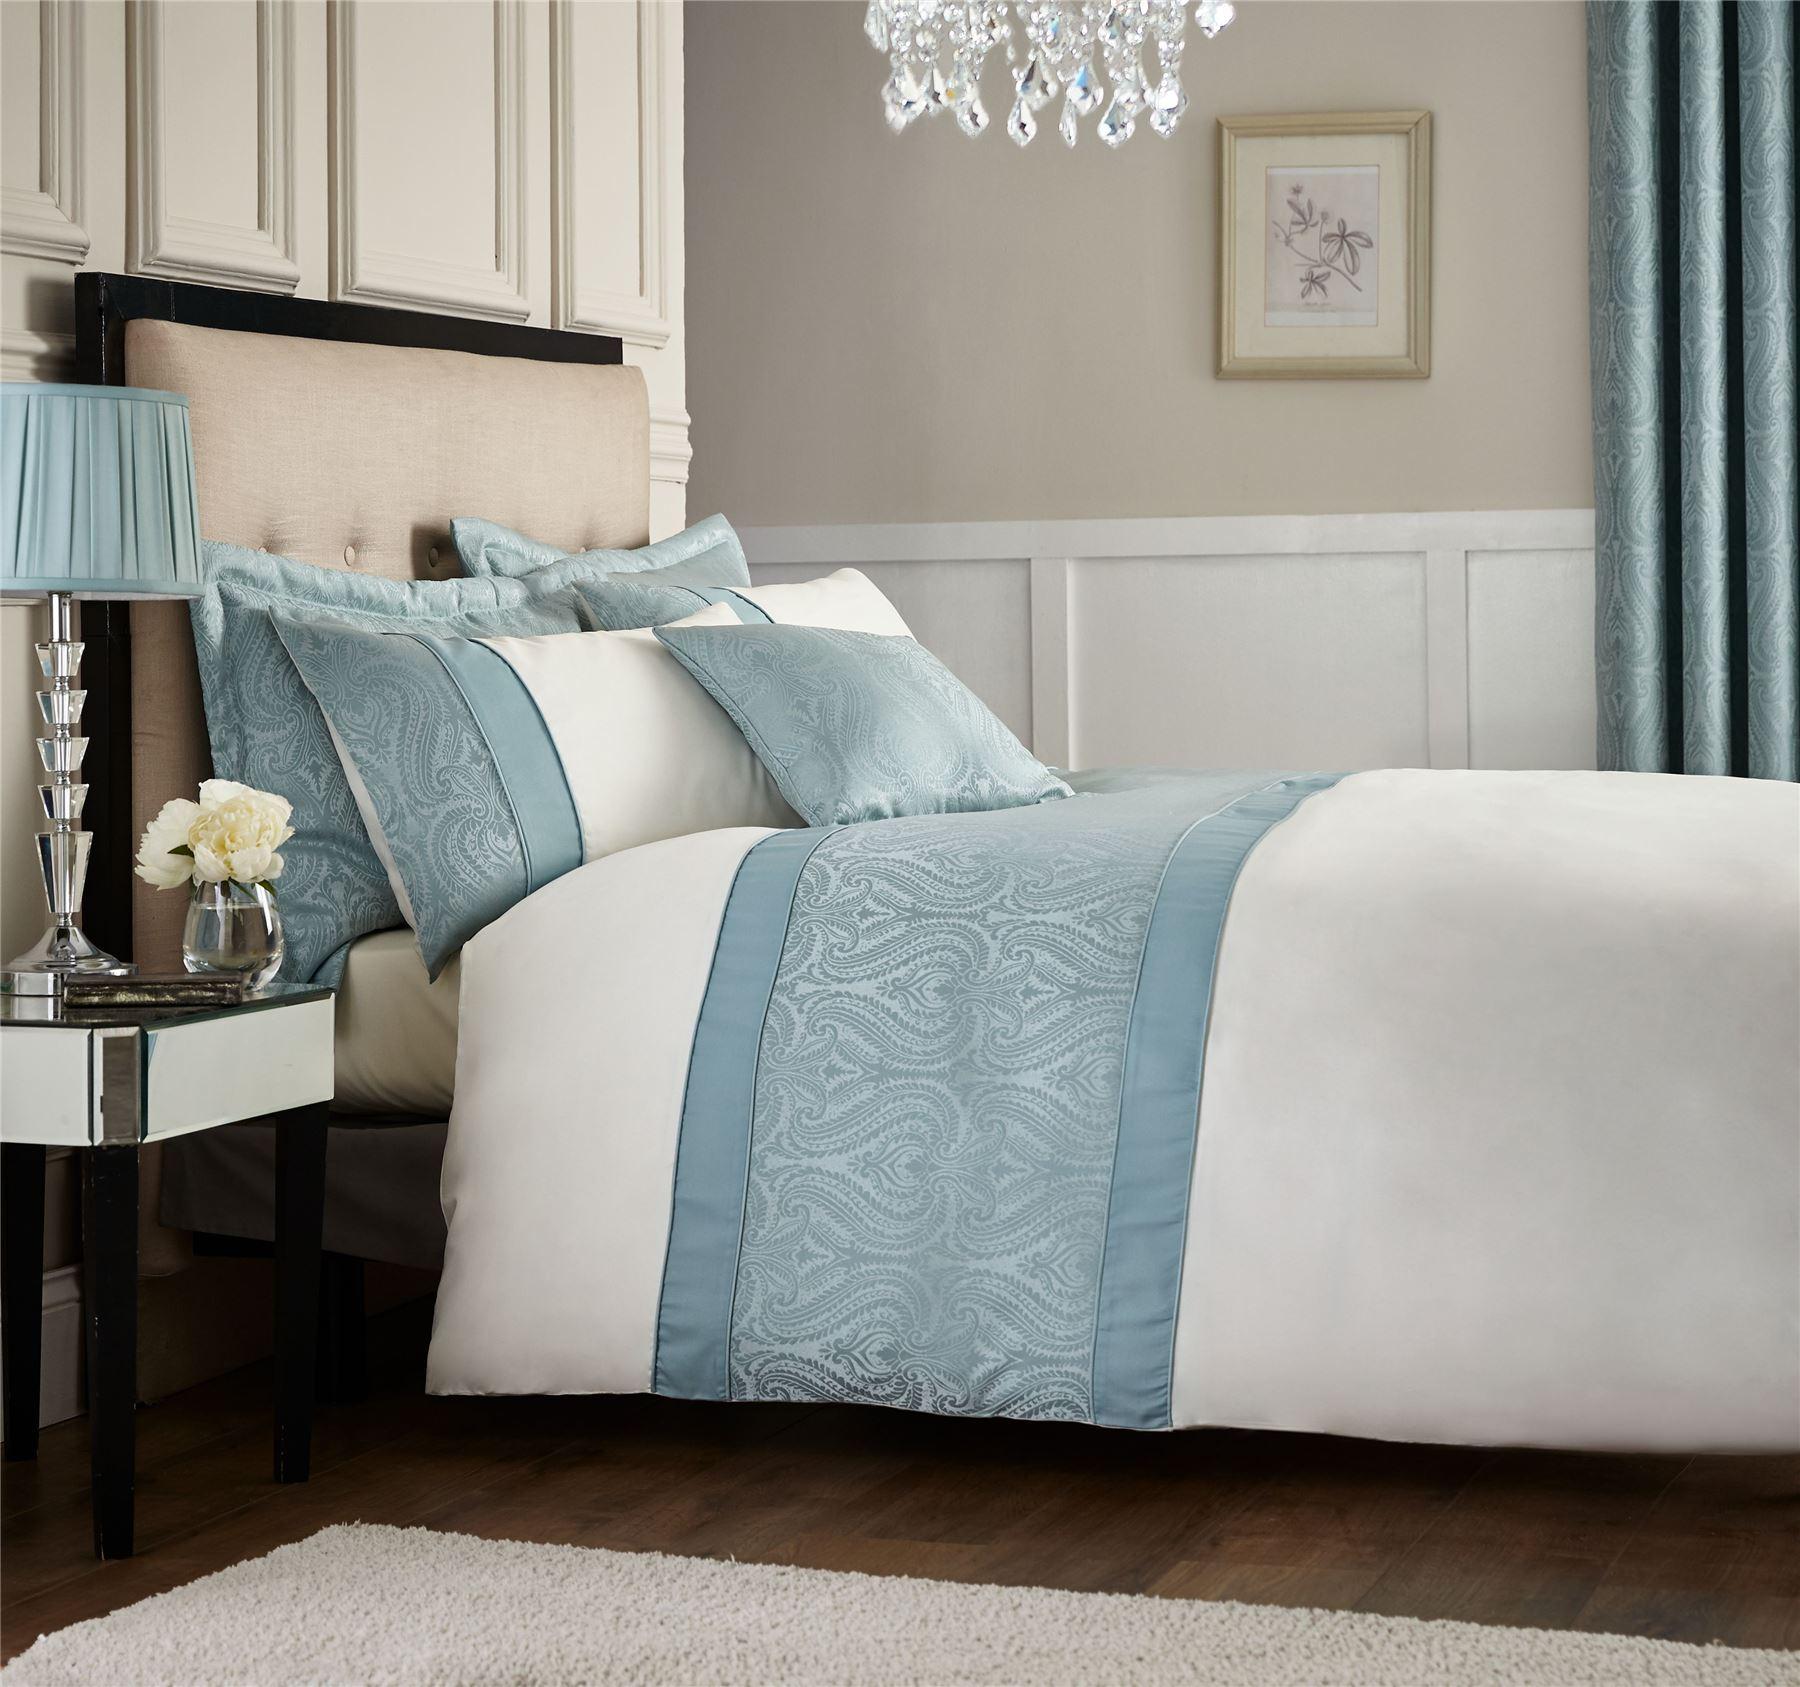 luxury ornate jacquard duvet quilt cover set double king size bedding duckegg ebay. Black Bedroom Furniture Sets. Home Design Ideas